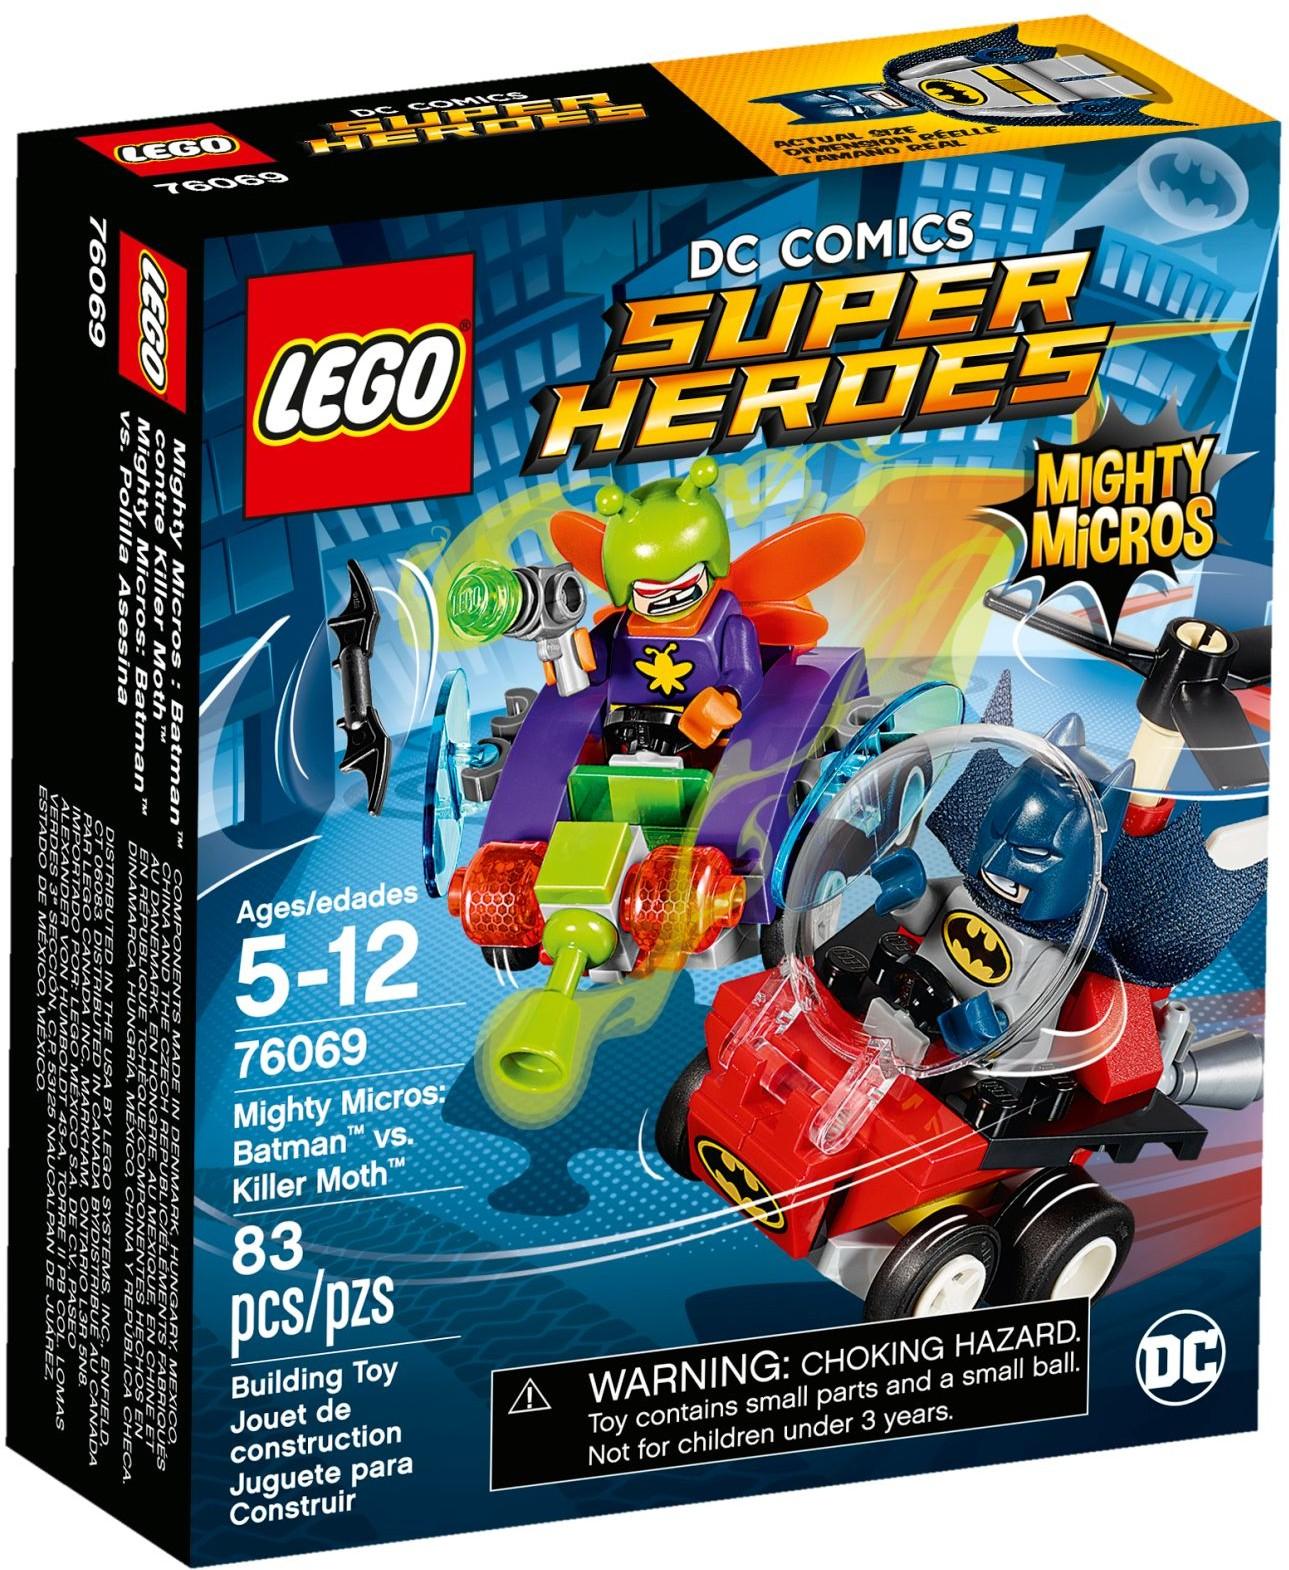 76069 Mighty Micros: Batman vs. Killer Moth